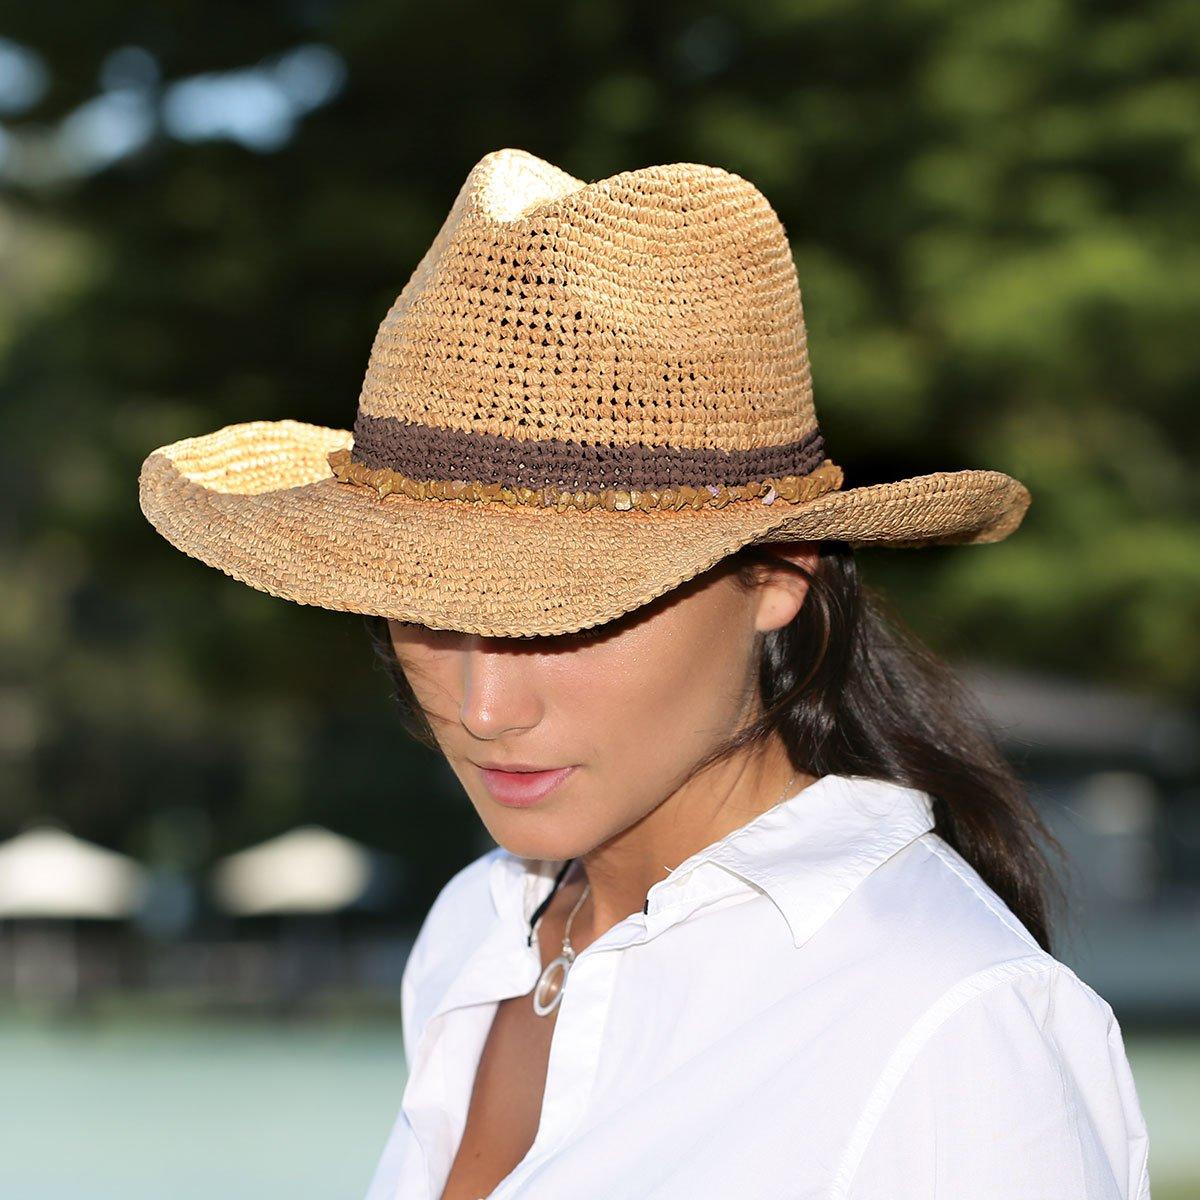 Tahiti Cowboy Sun Protection Hat Cowboy My Style